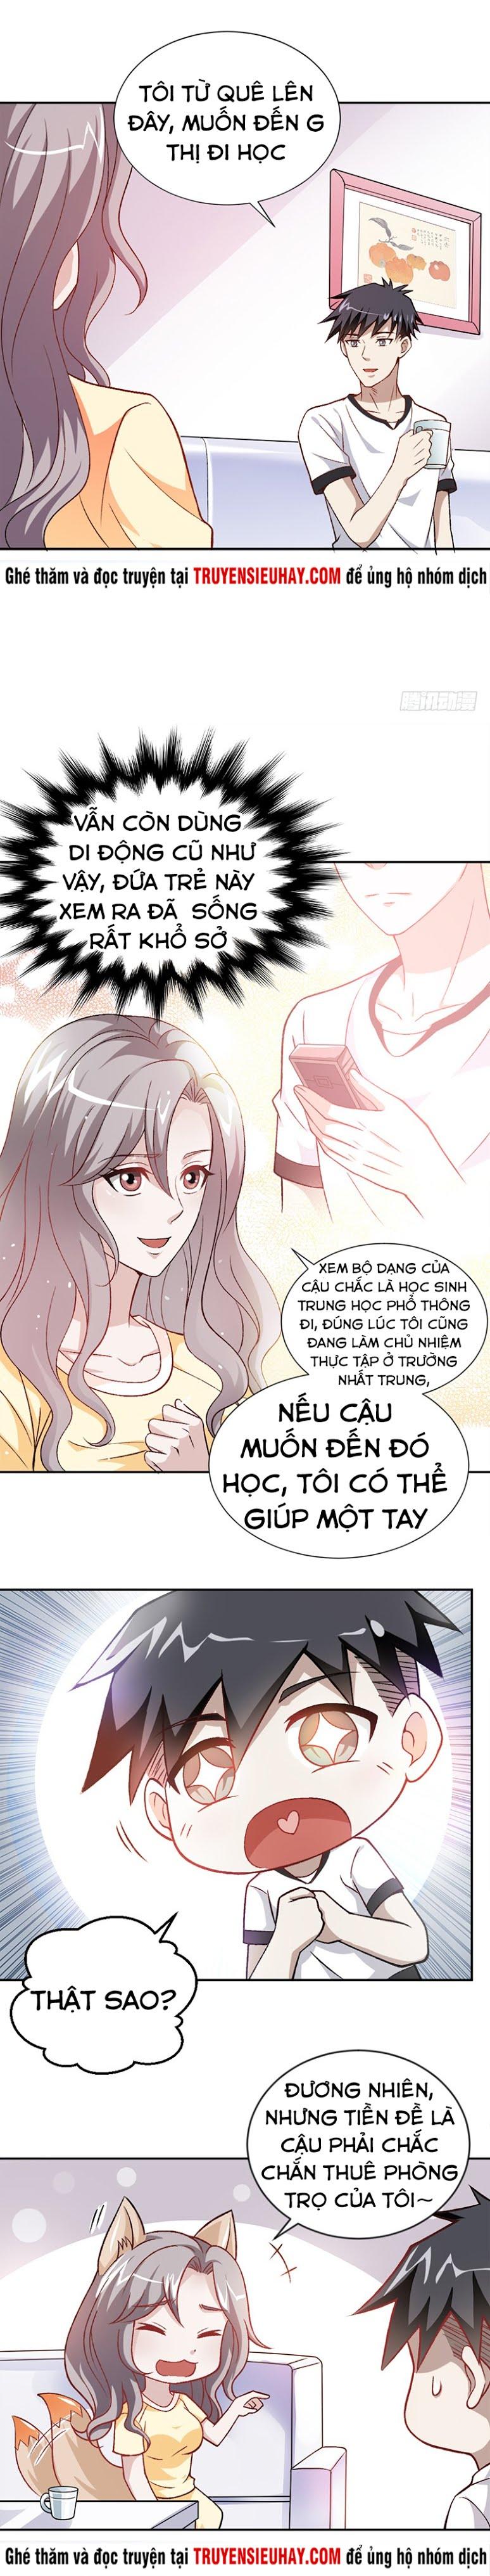 Táng Kiếm Quyết Chapter 3 video - Hamtruyen.vn